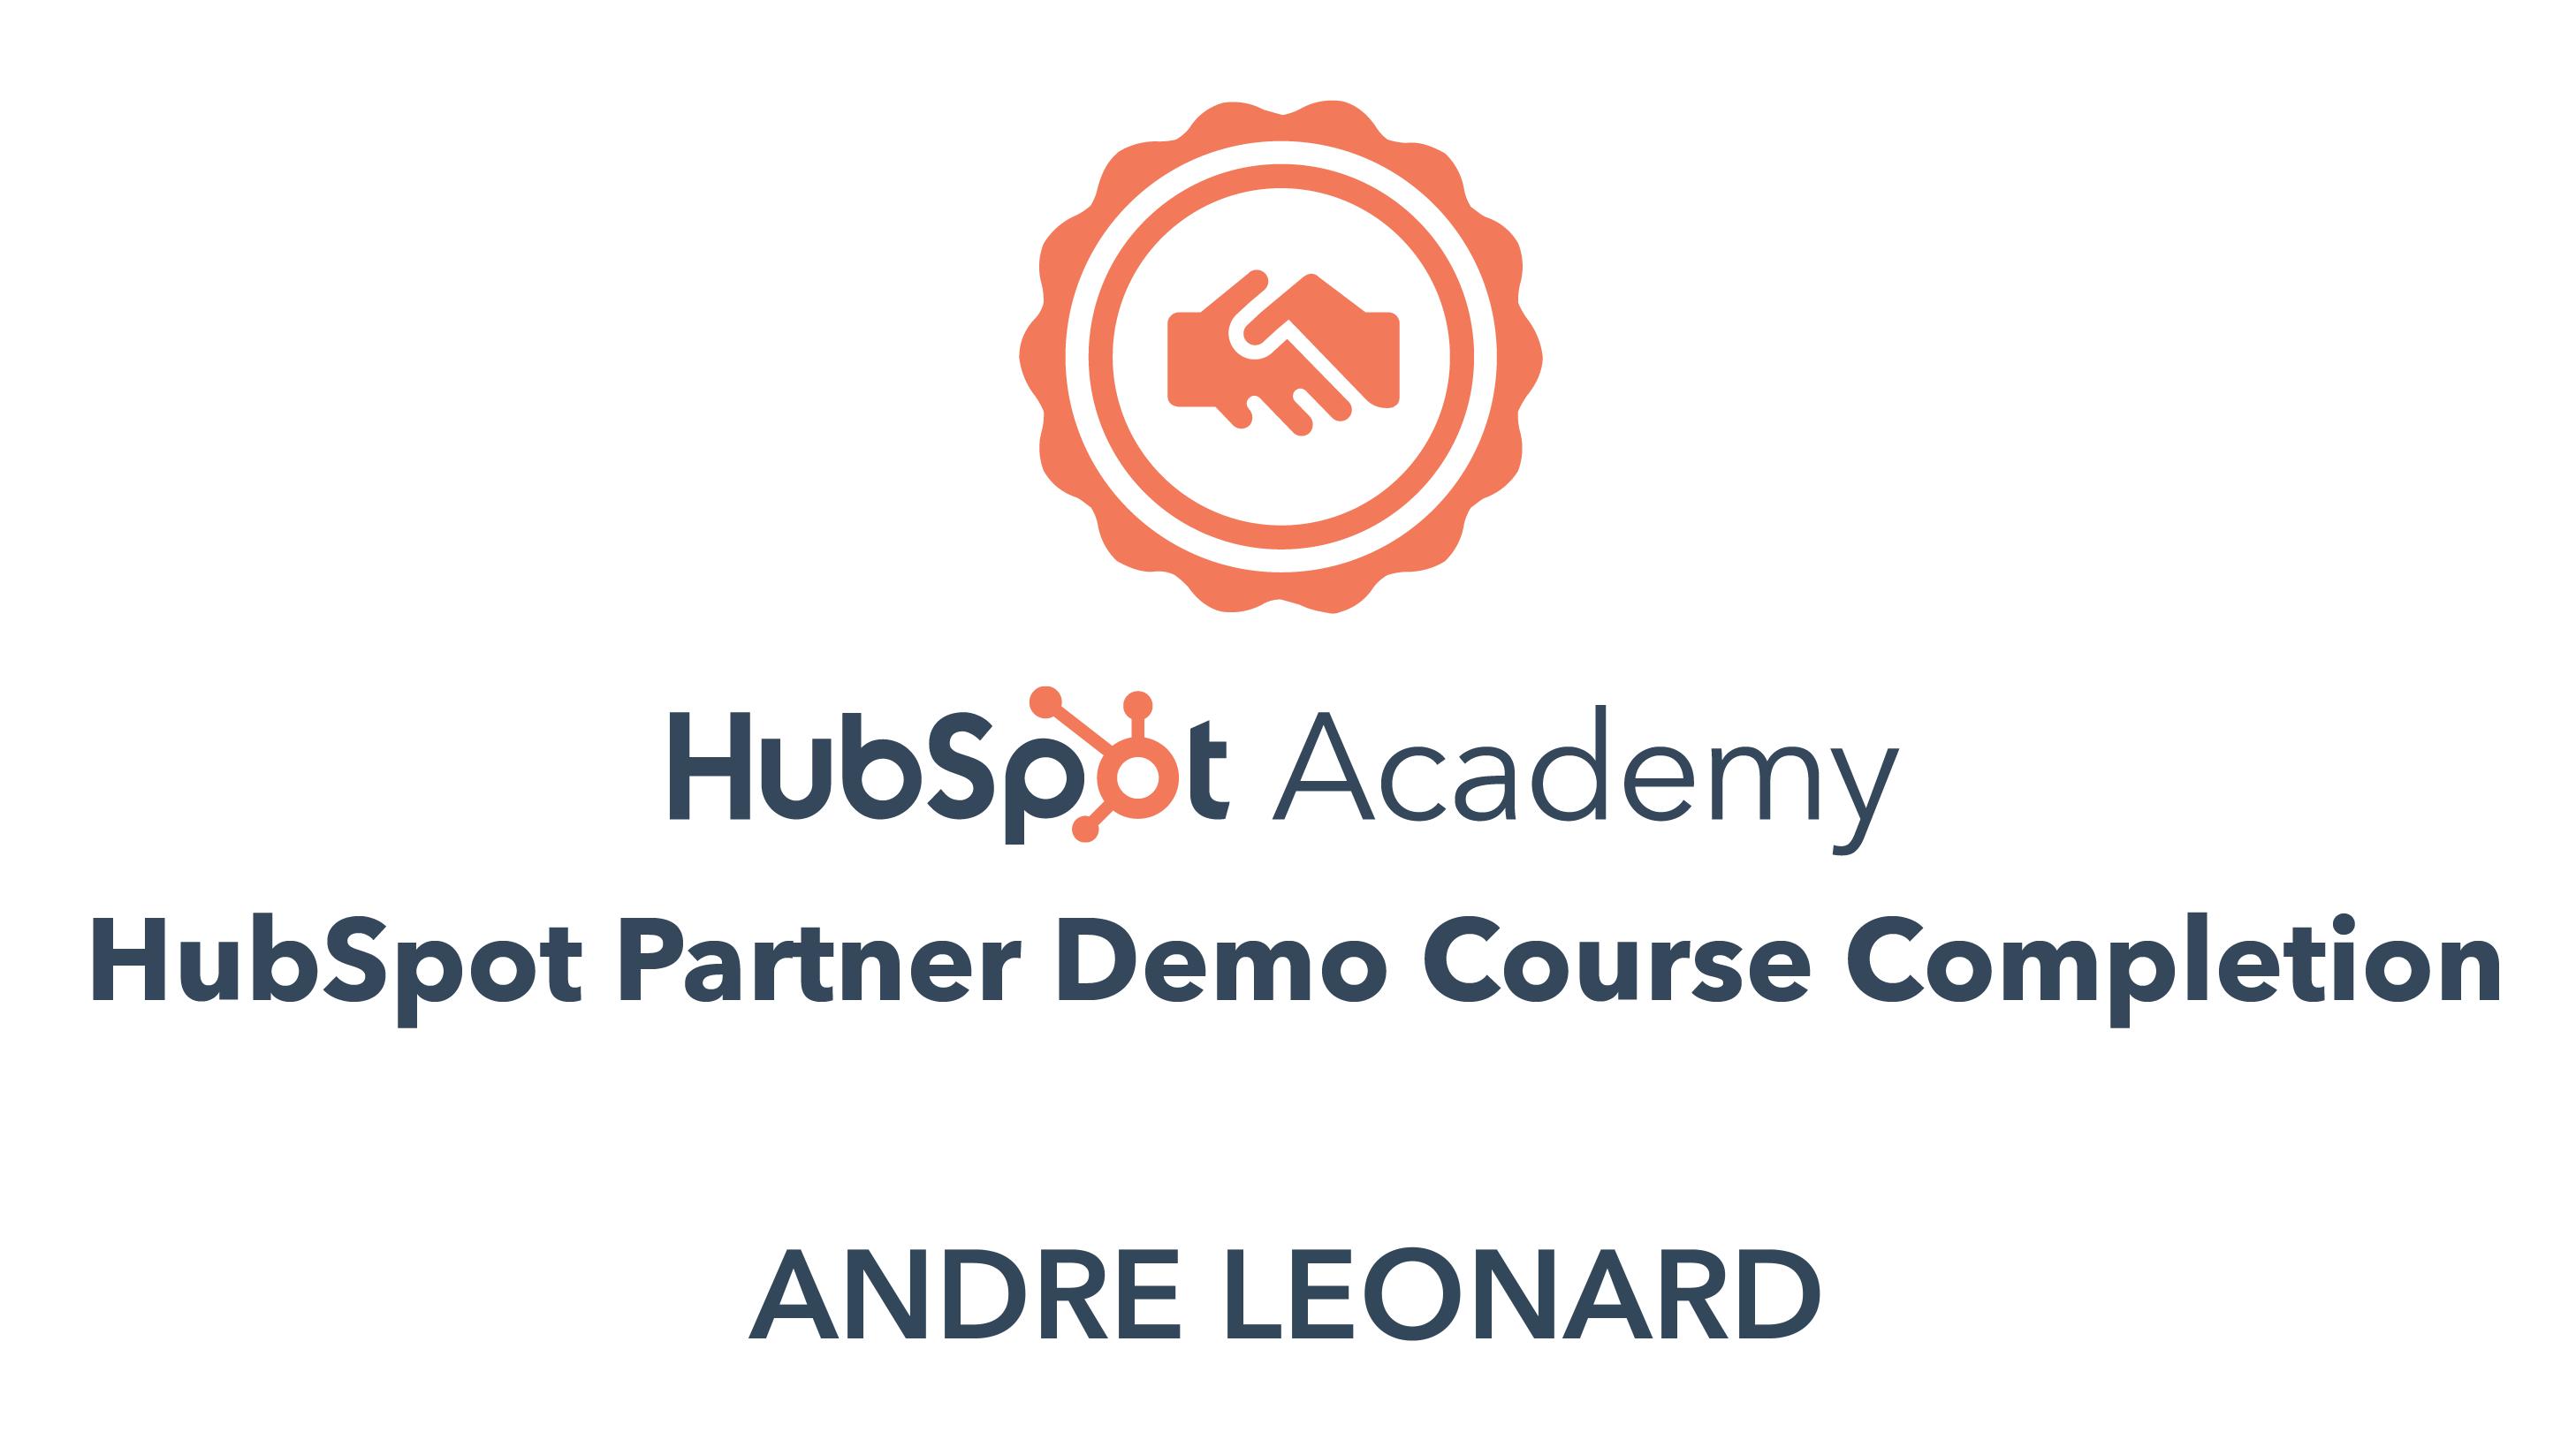 Andre - Partner Demo Course Certification